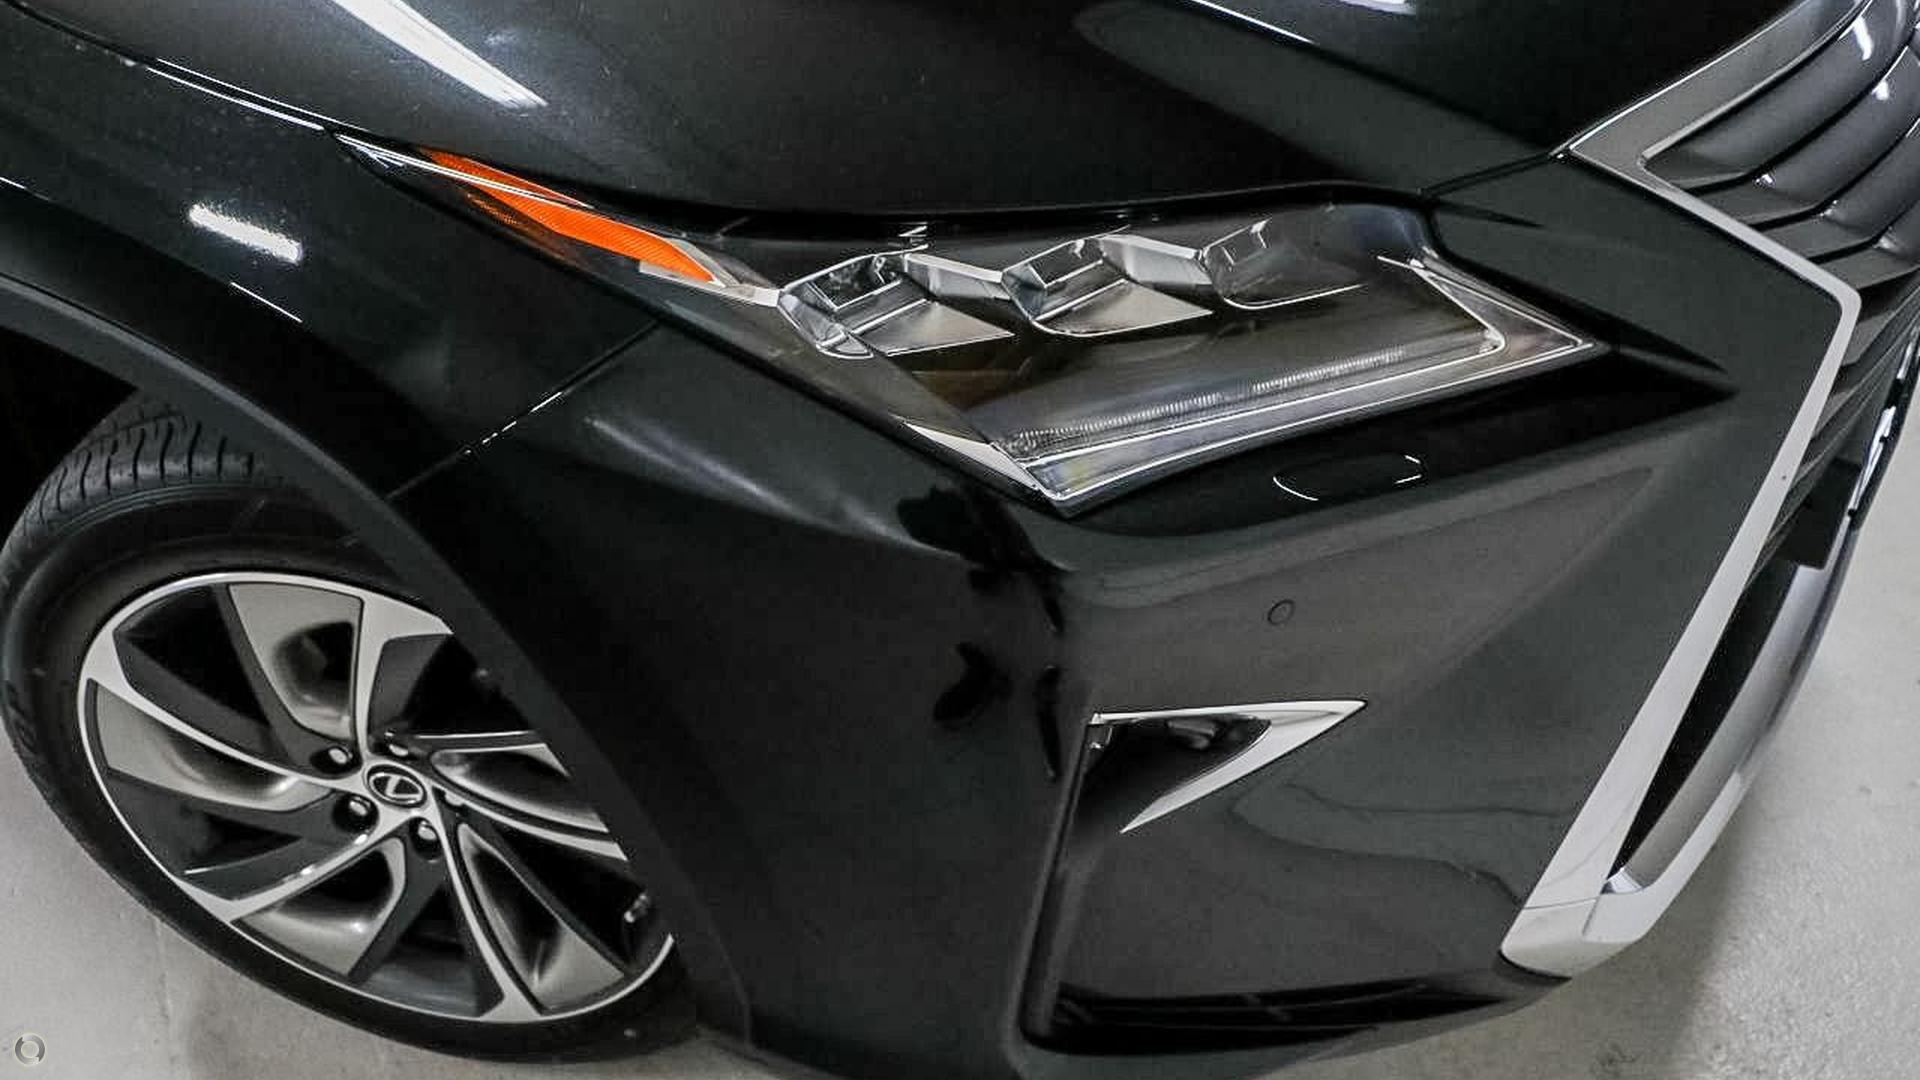 2018 Lexus Rx350 Sports Luxury GGL25R